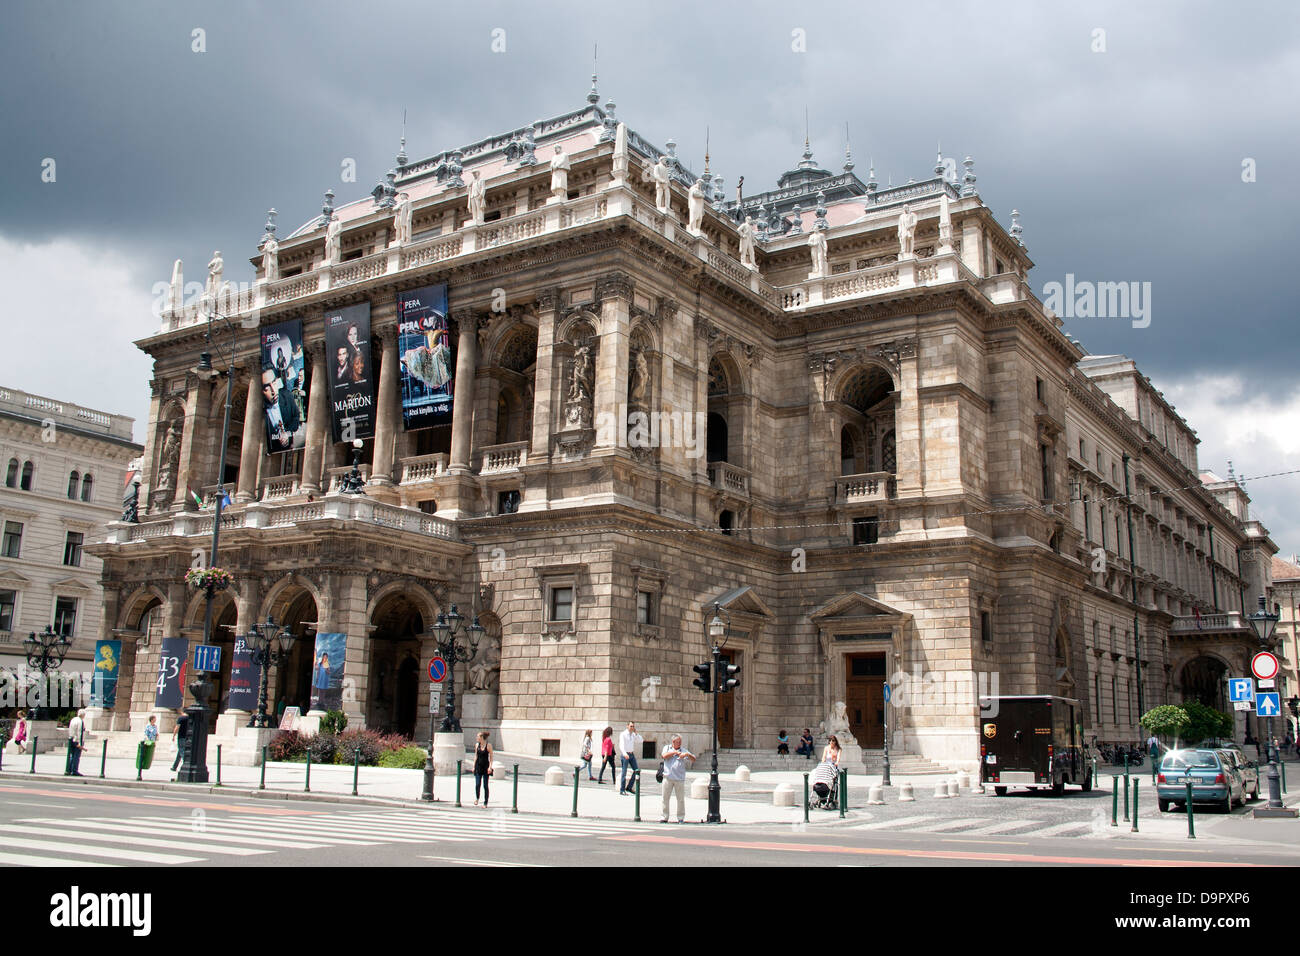 The Hungarian State Opera House - Magyar Állami Operaház - Andrássy Street Budapest Hungary - Stock Image